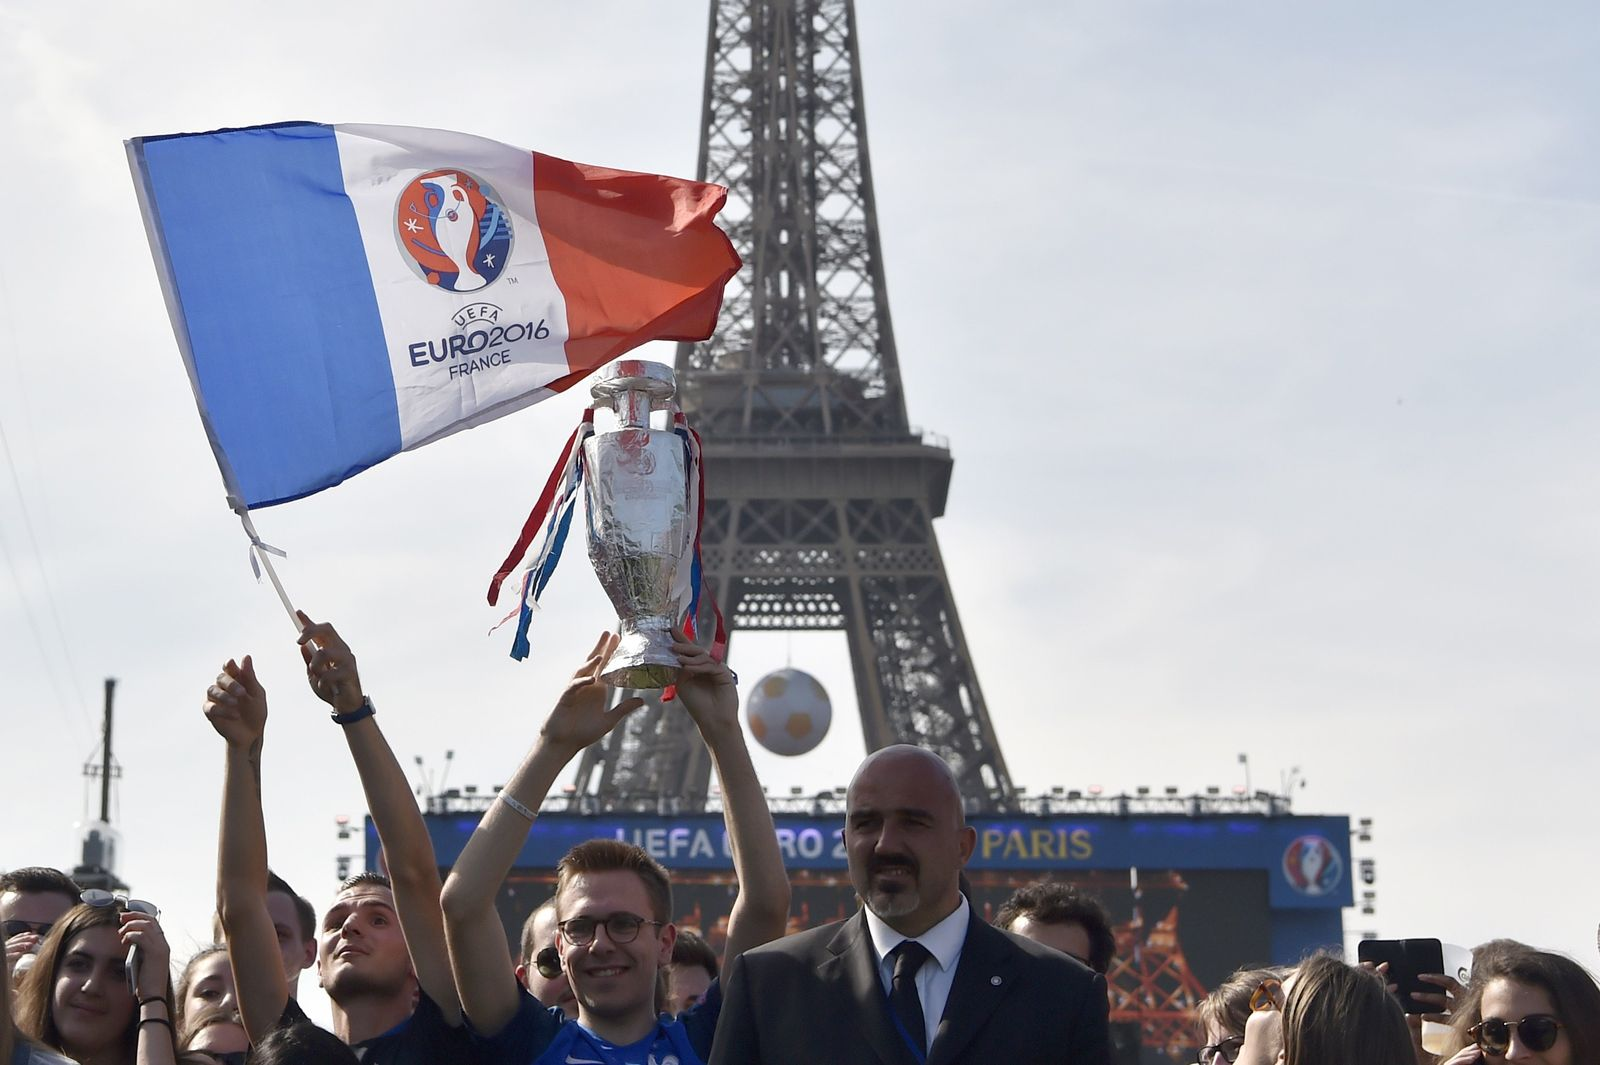 FBL-EURO-2016-FRA-FANZONE